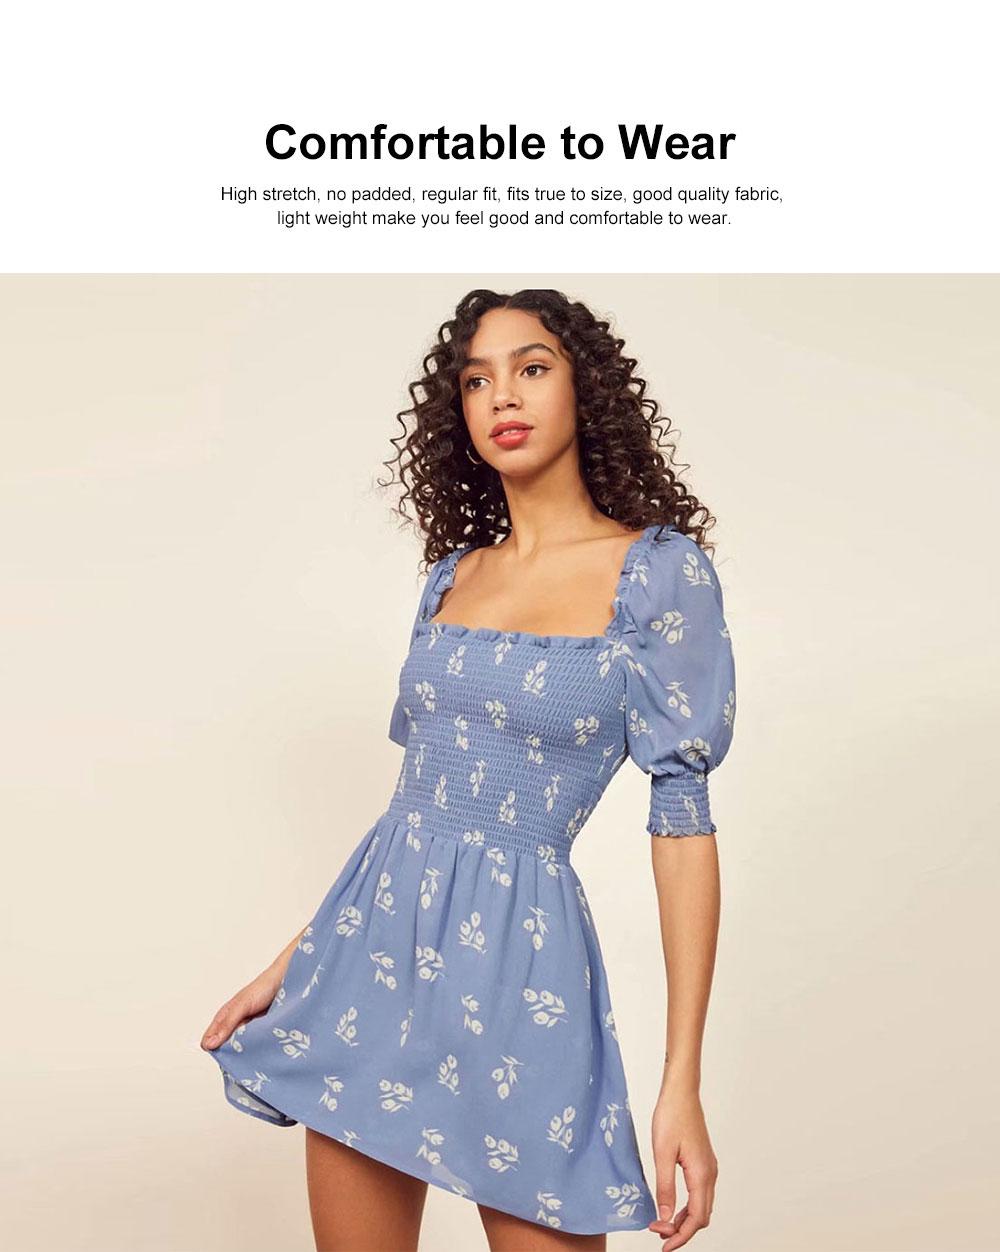 One Piece French Style Women Dress Pleated &High Waist Knee Length Summer Dress Ruffle Sleeve Dress for Women's Gifts 1